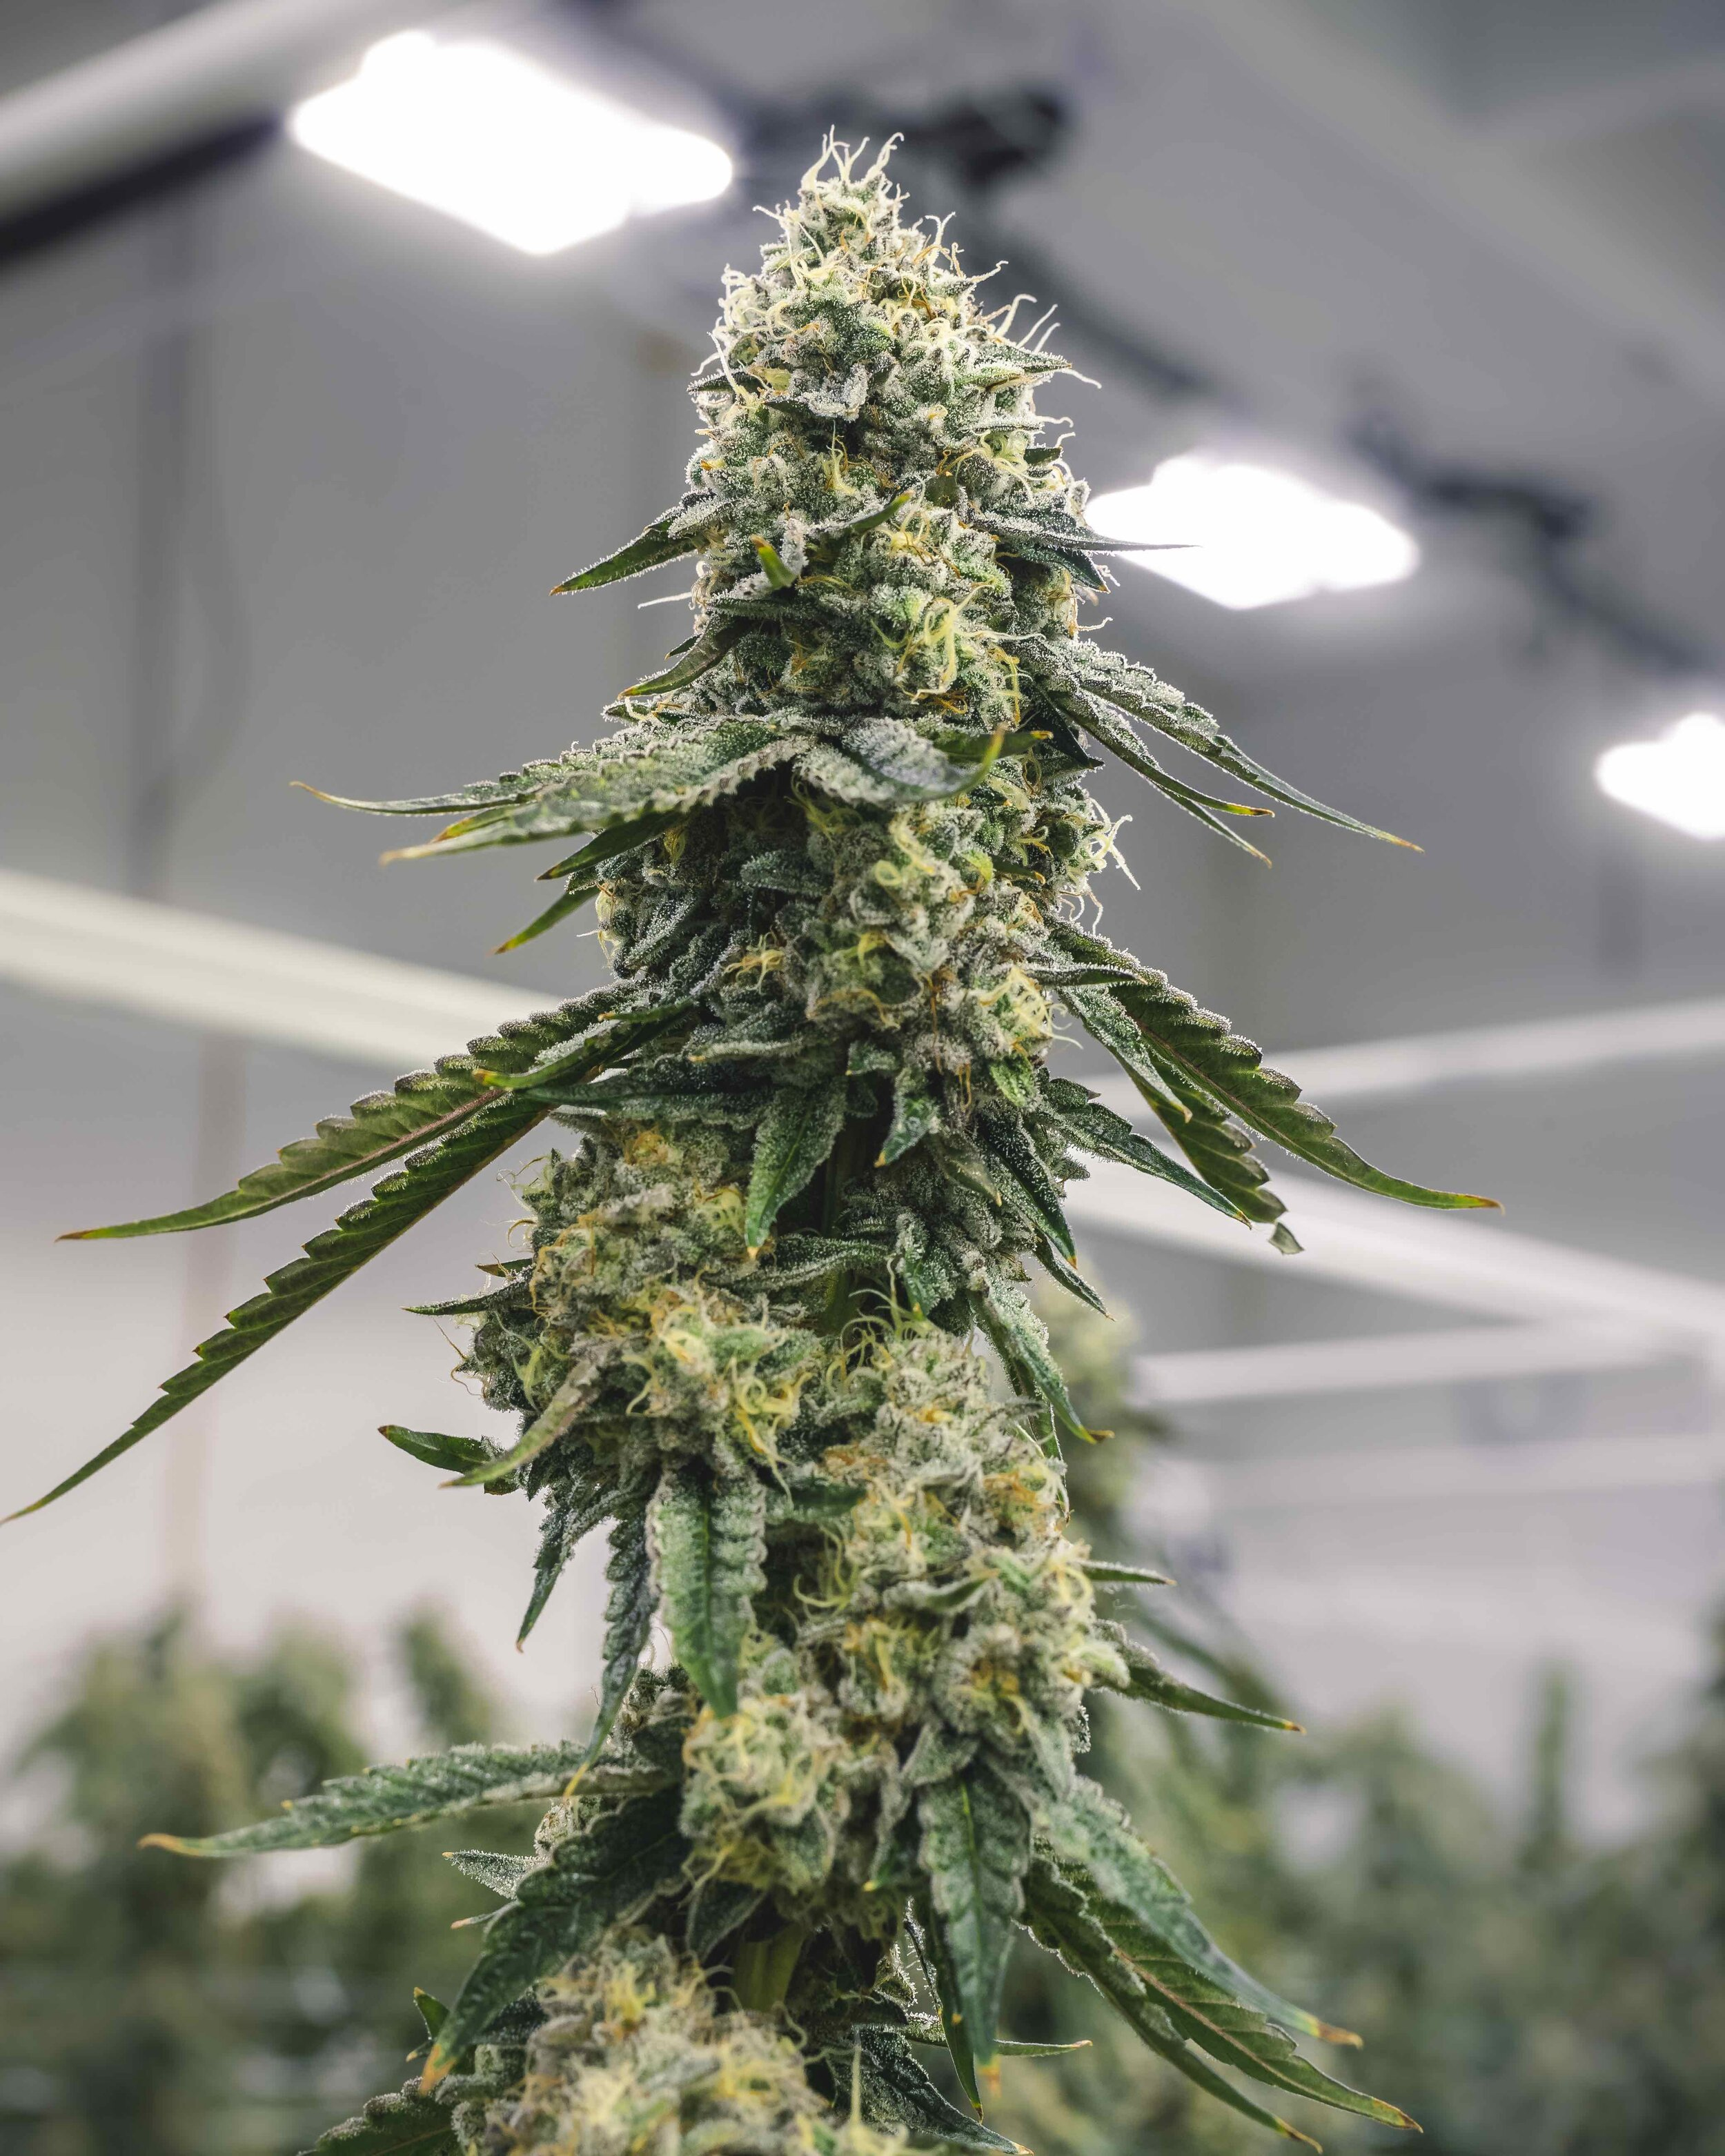 Tall_Marijuana_Bud_Growing_on_Plant_at_Indoor_Commercial_Garden_Facility.jpeg